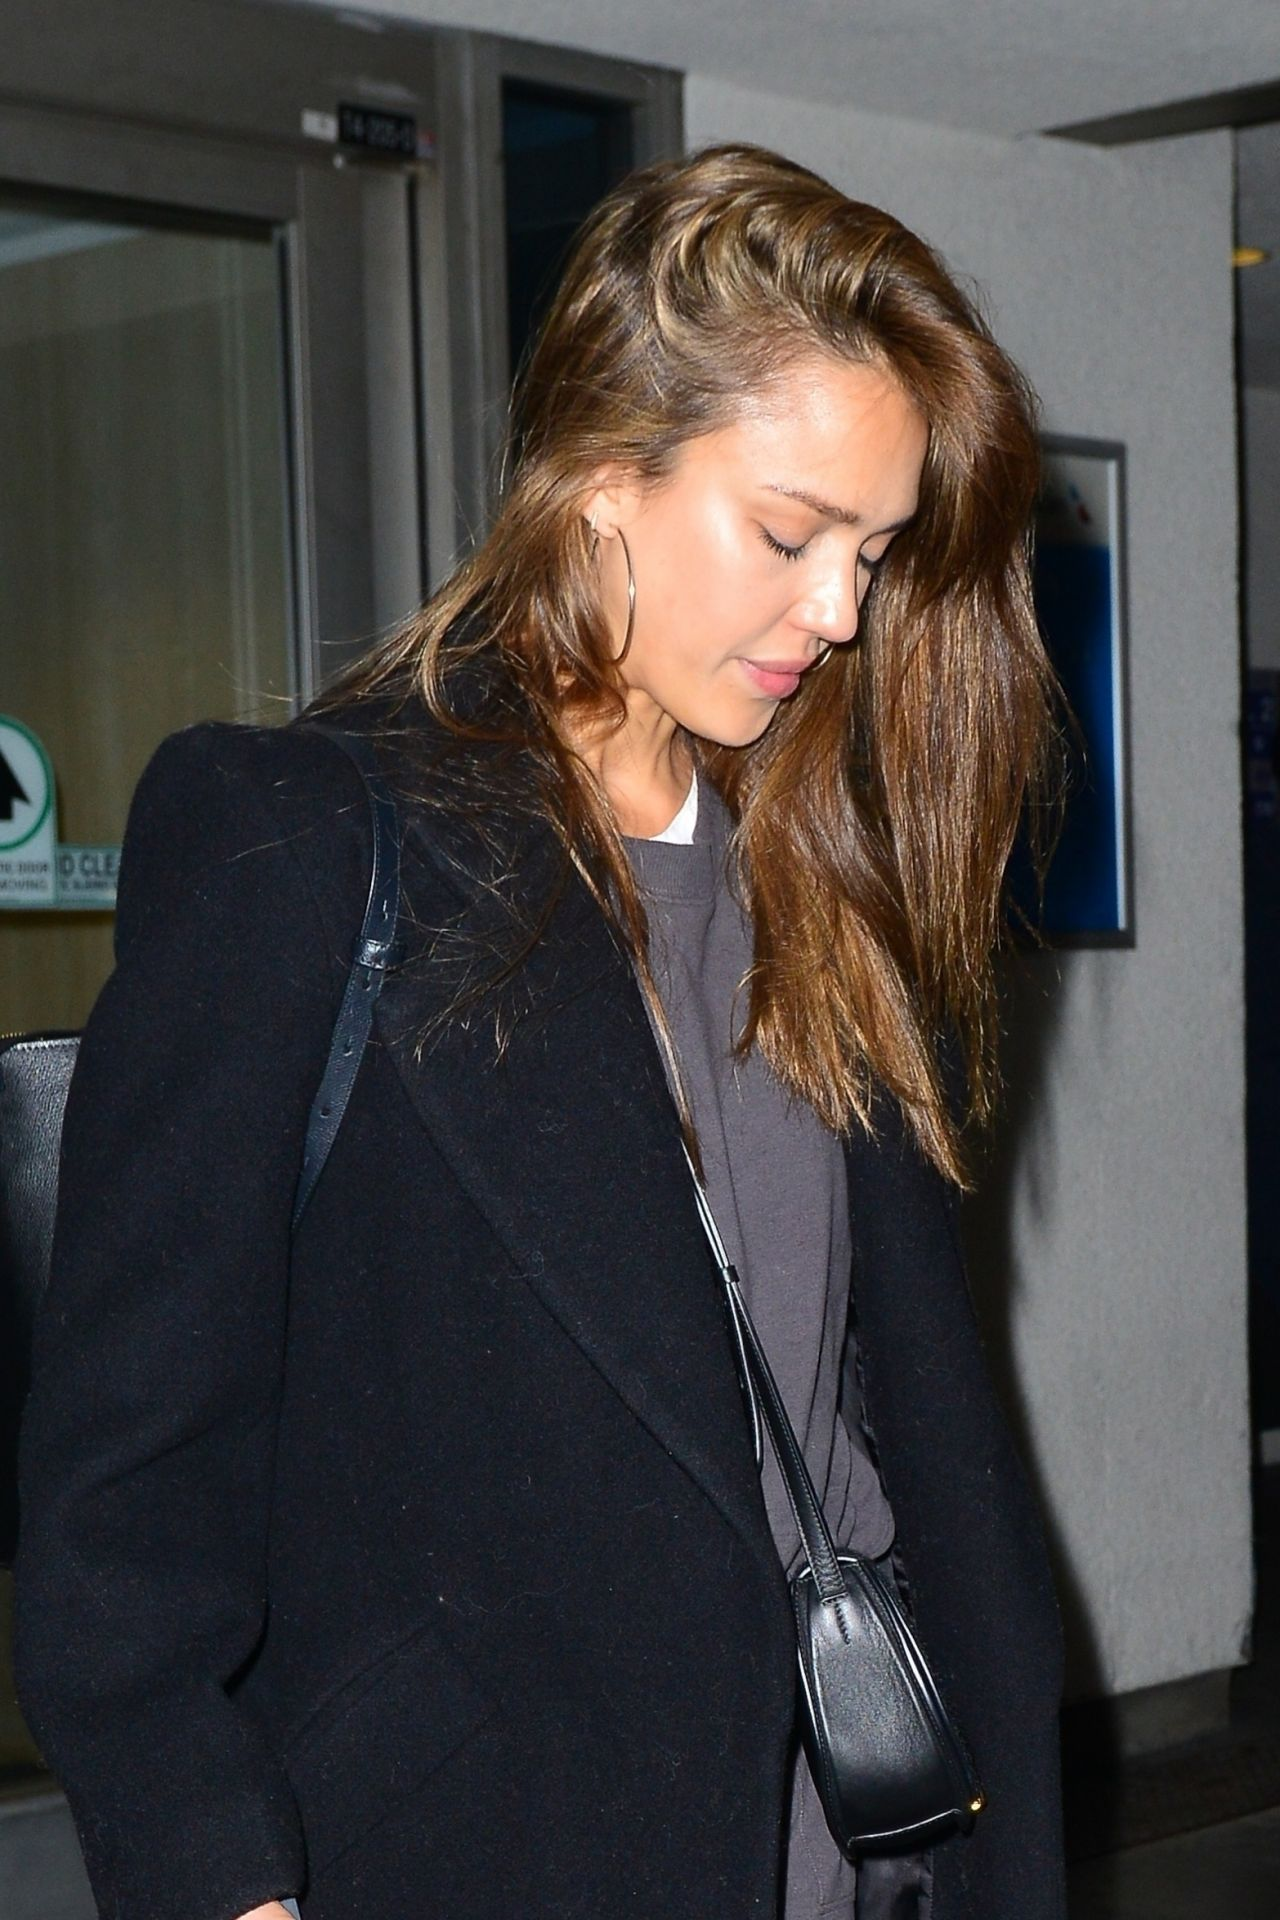 https://celebmafia.com/wp-content/uploads/2019/03/jessica-alba-in-travel-outfit-at-lax-in-la-03-29-2019-7.jpg